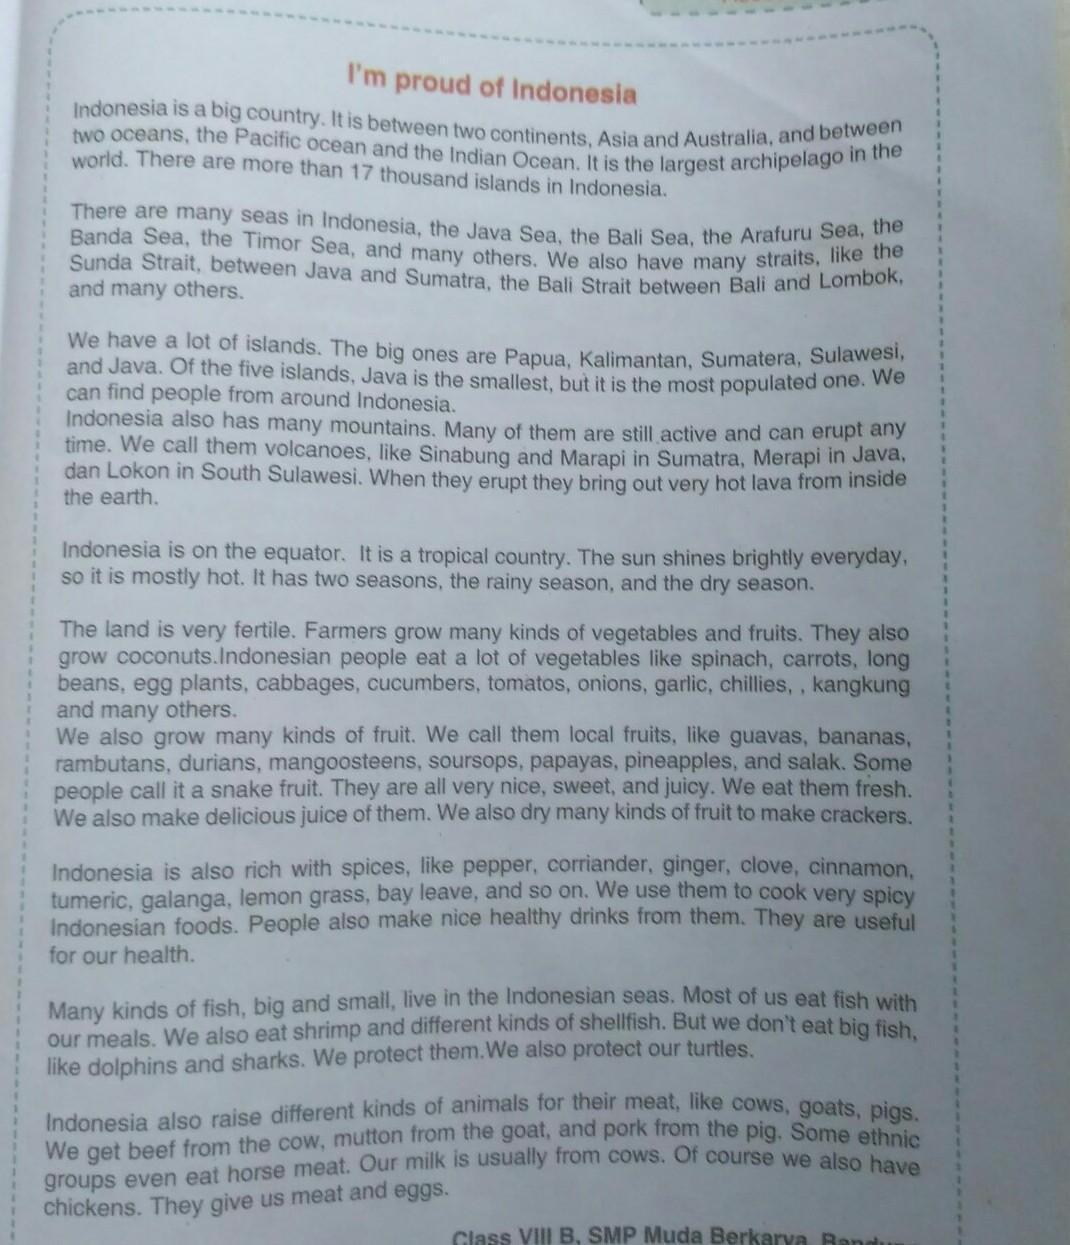 Terjemahan Arti Dari Buku Paket Bahasa Inggris Halaman 173 Kelas 7 Brainly Co Id